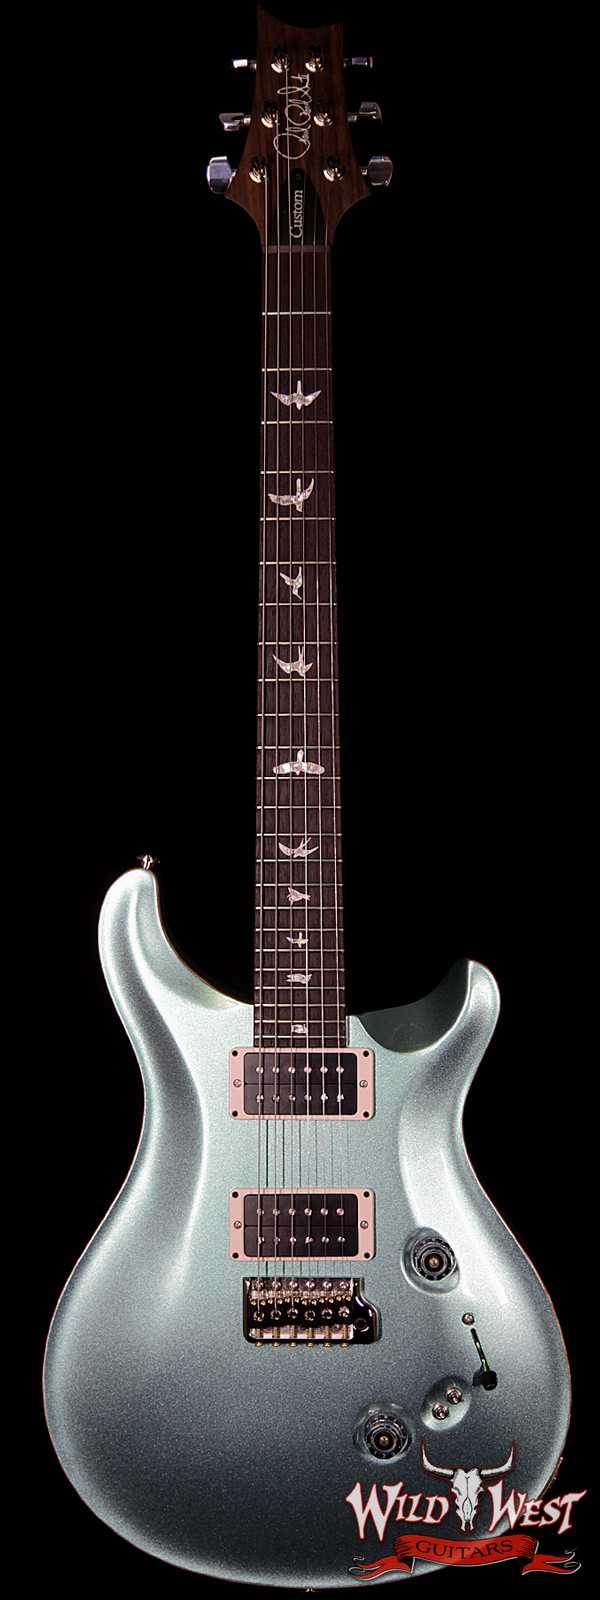 Paul Reed Smith PRS Custom 24-08 Rosewood Fingerboard Frost Blue Metallic